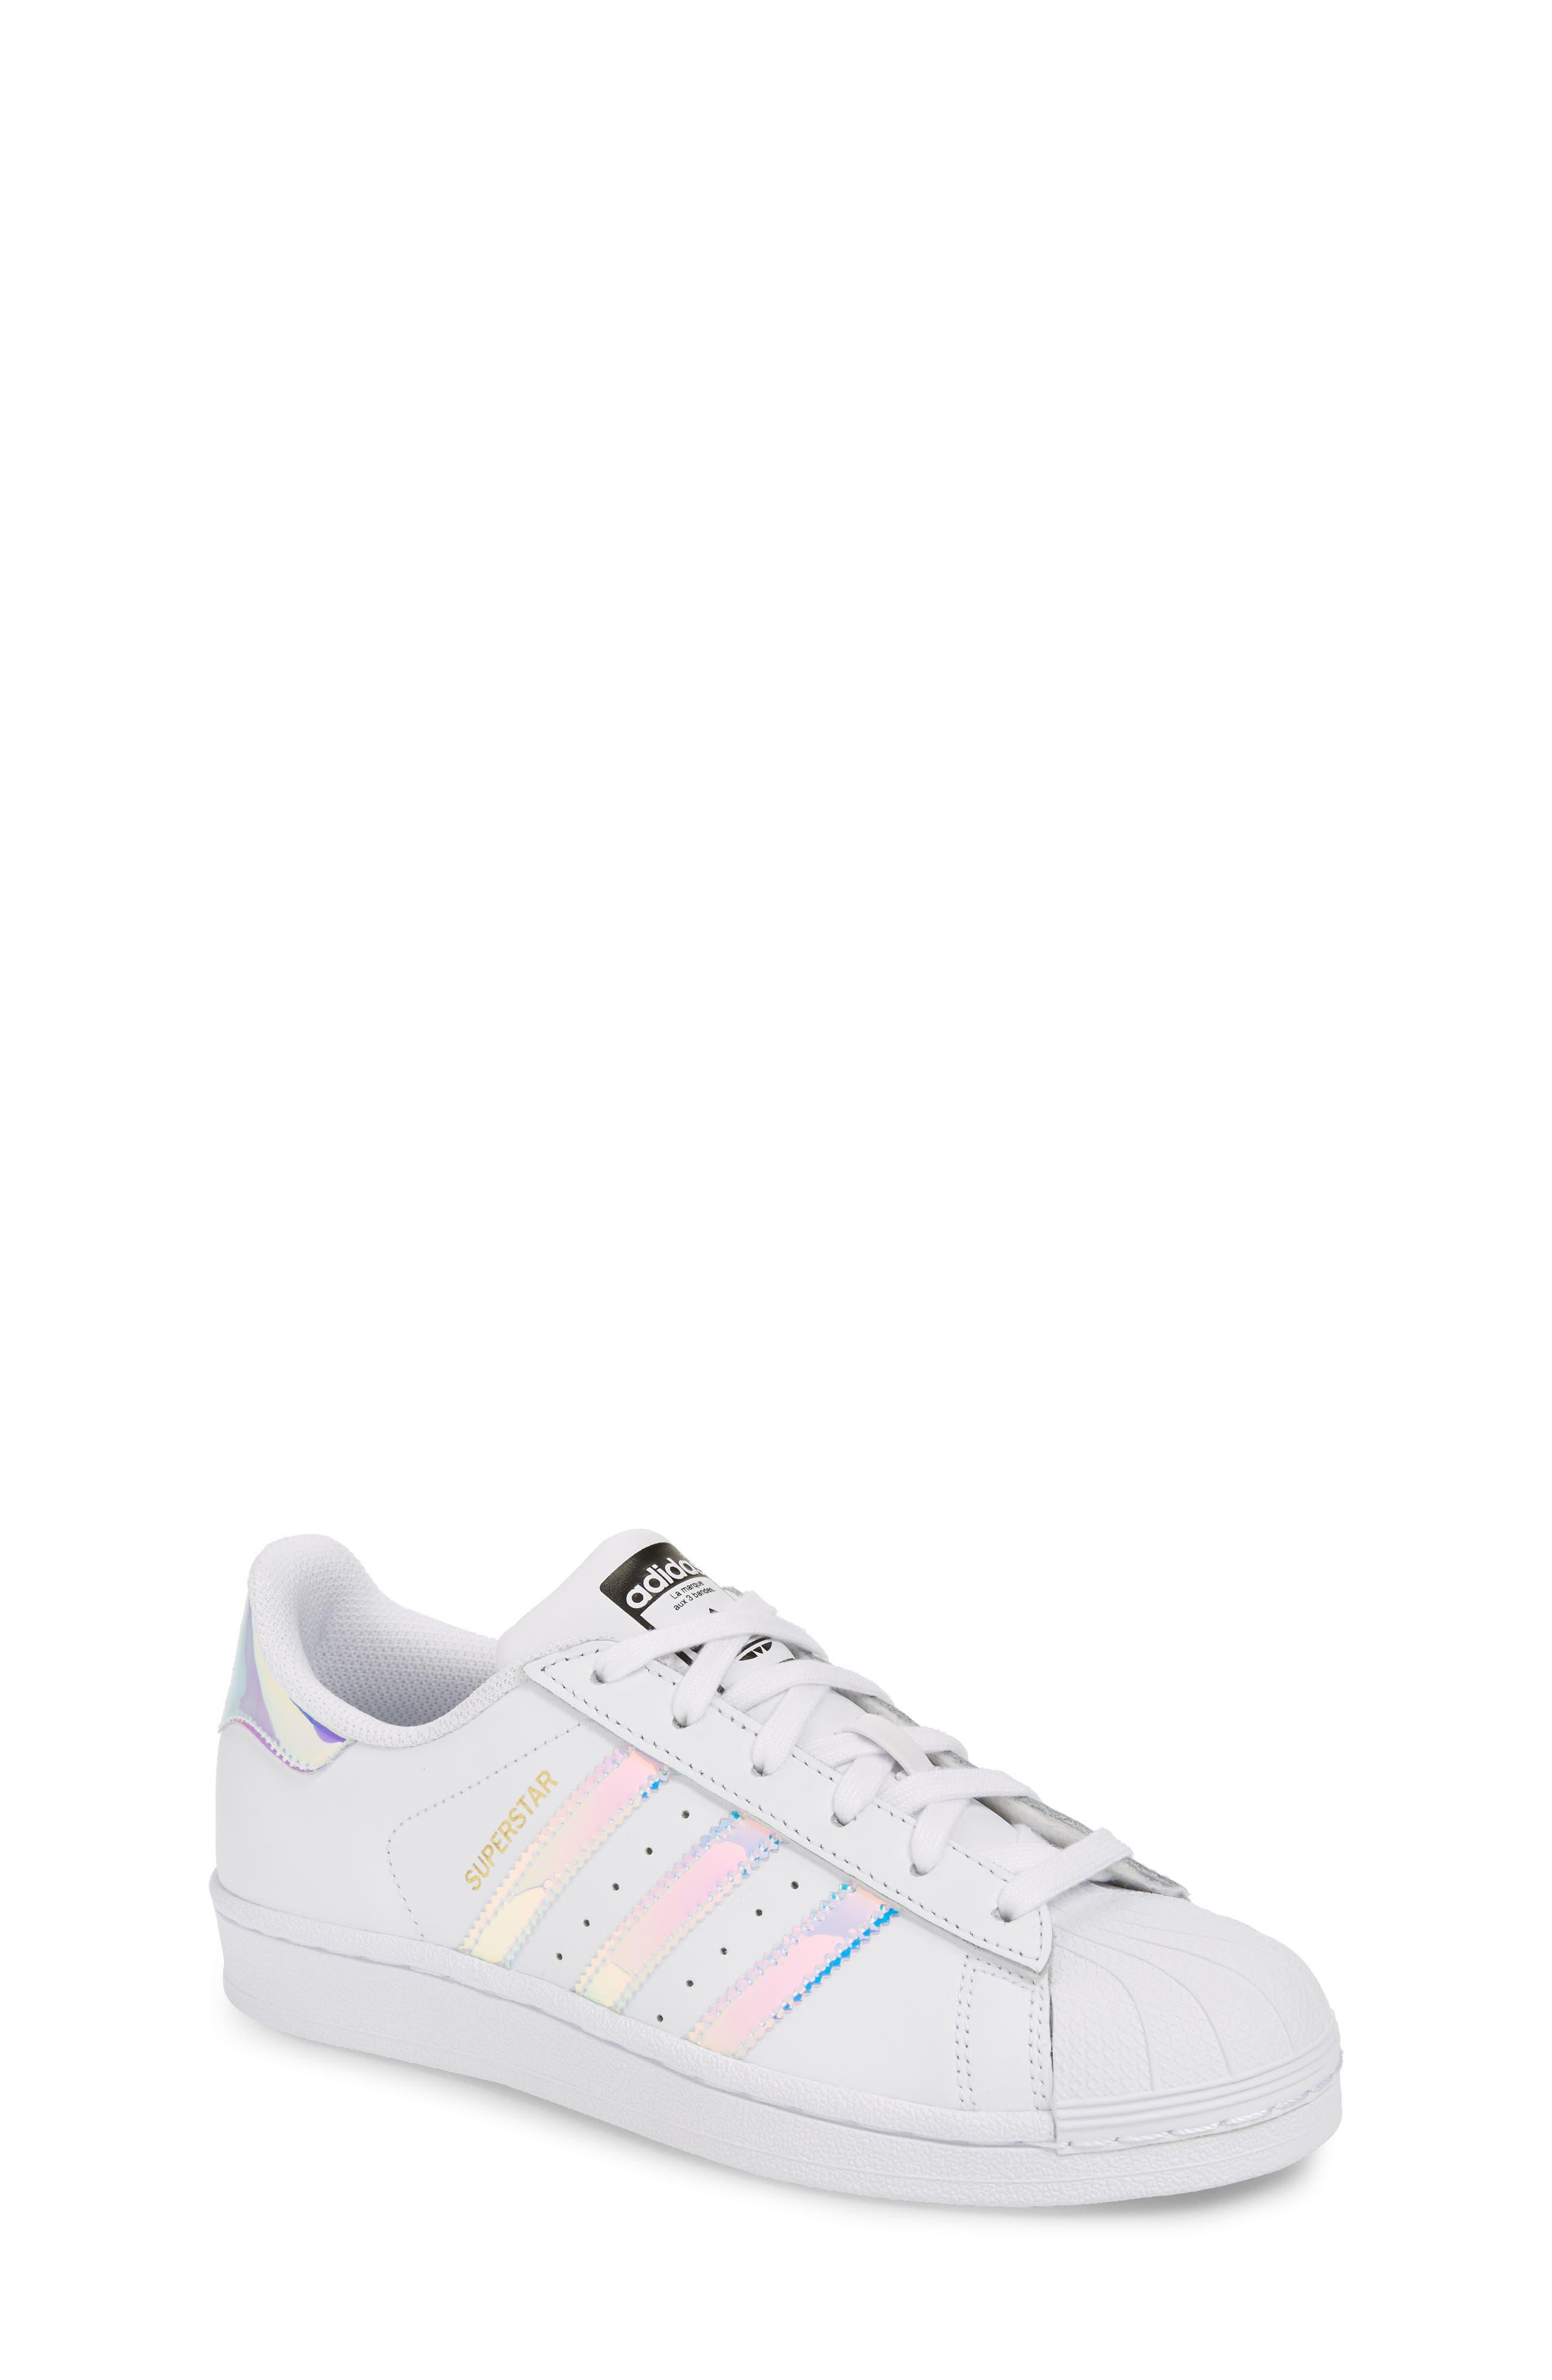 Superstar - Iridescent Sneaker,                             Alternate thumbnail 2, color,                             SILVER METALLIC/ WHITE